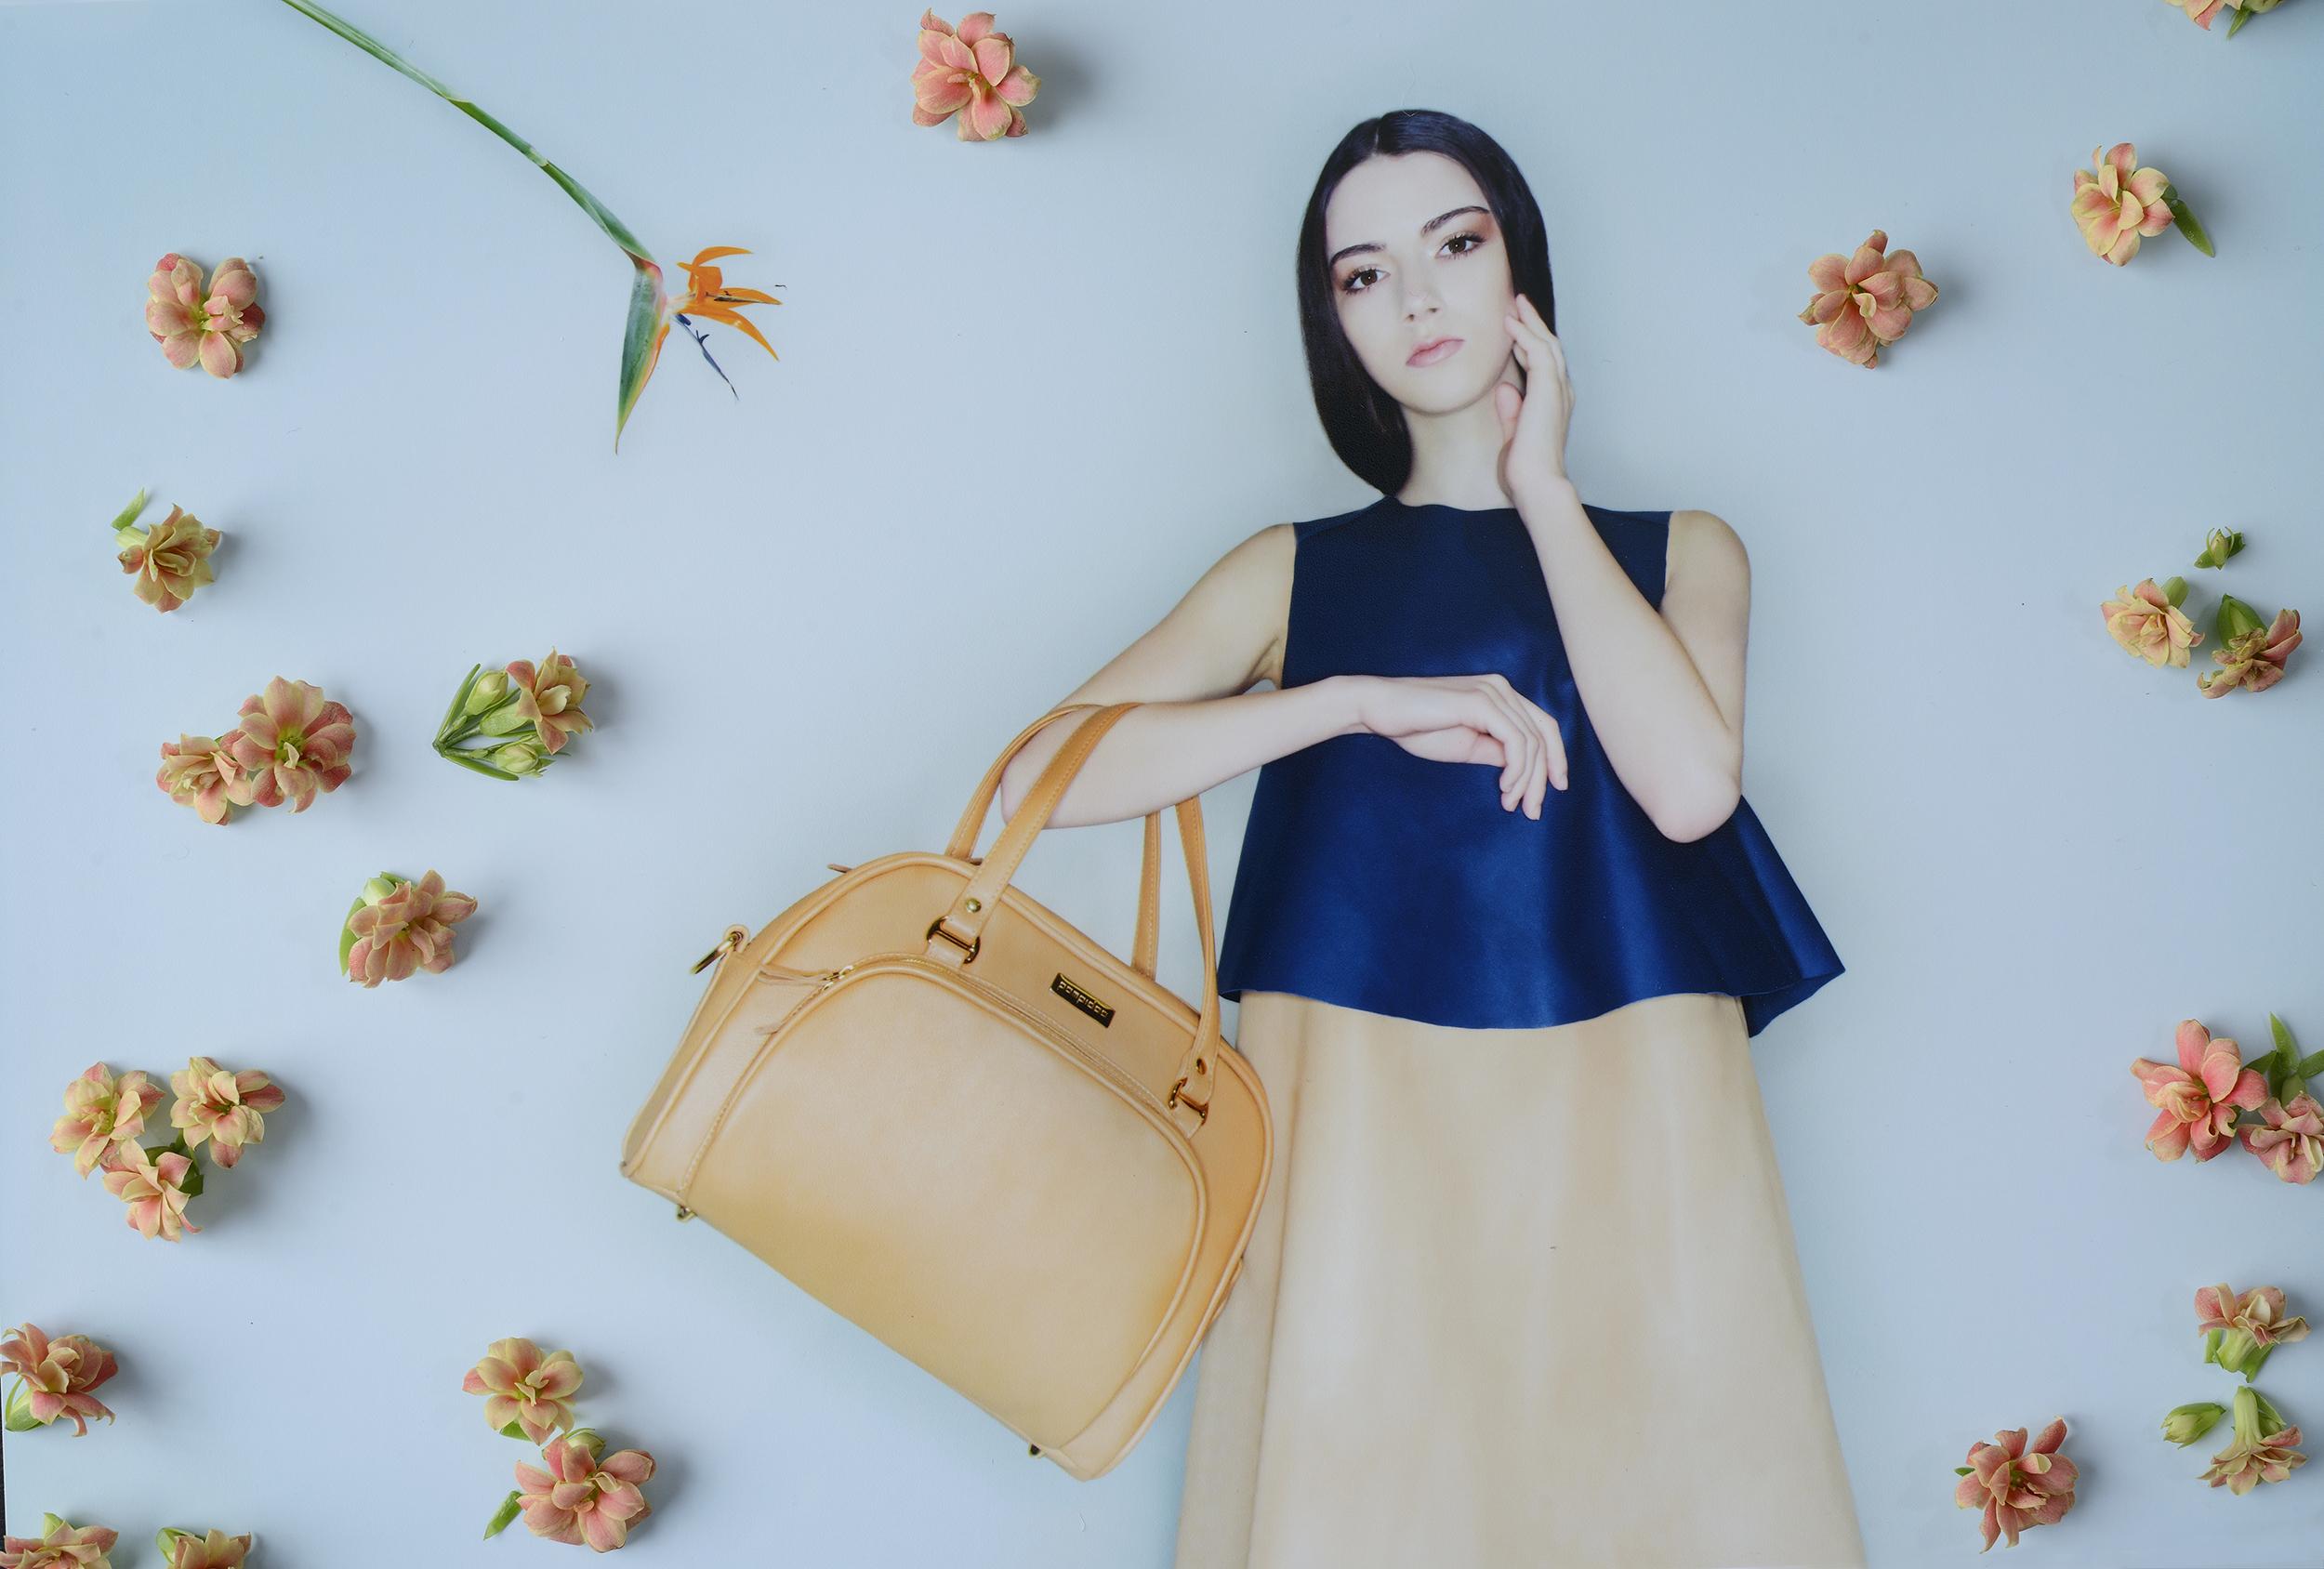 POMPIDOO_Palermo_stylish_camera_bag_Almond_main